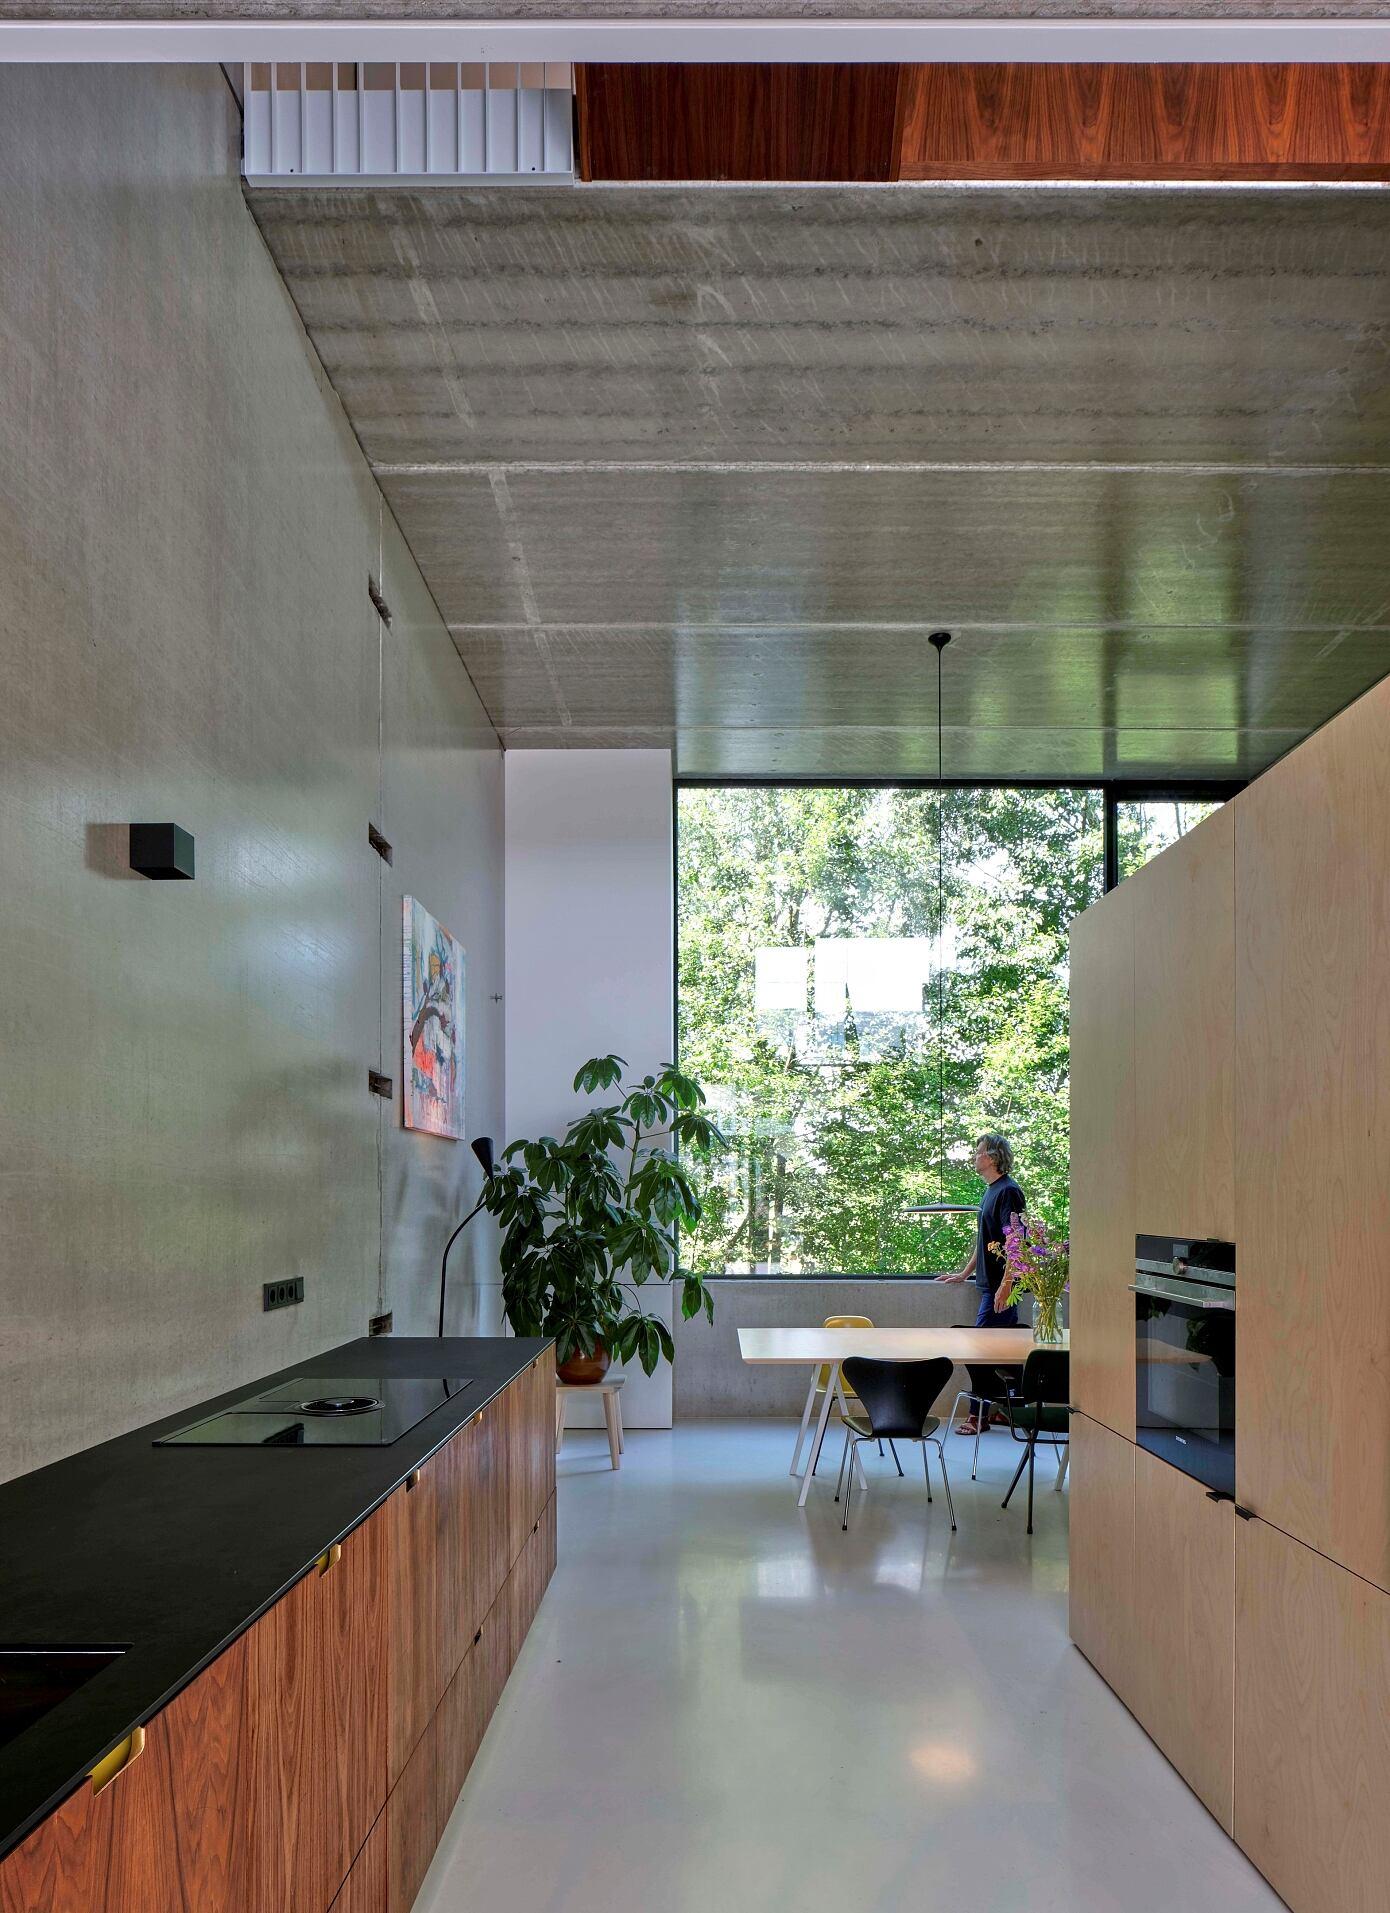 Zigzag House by Jasper Smiths Architecture